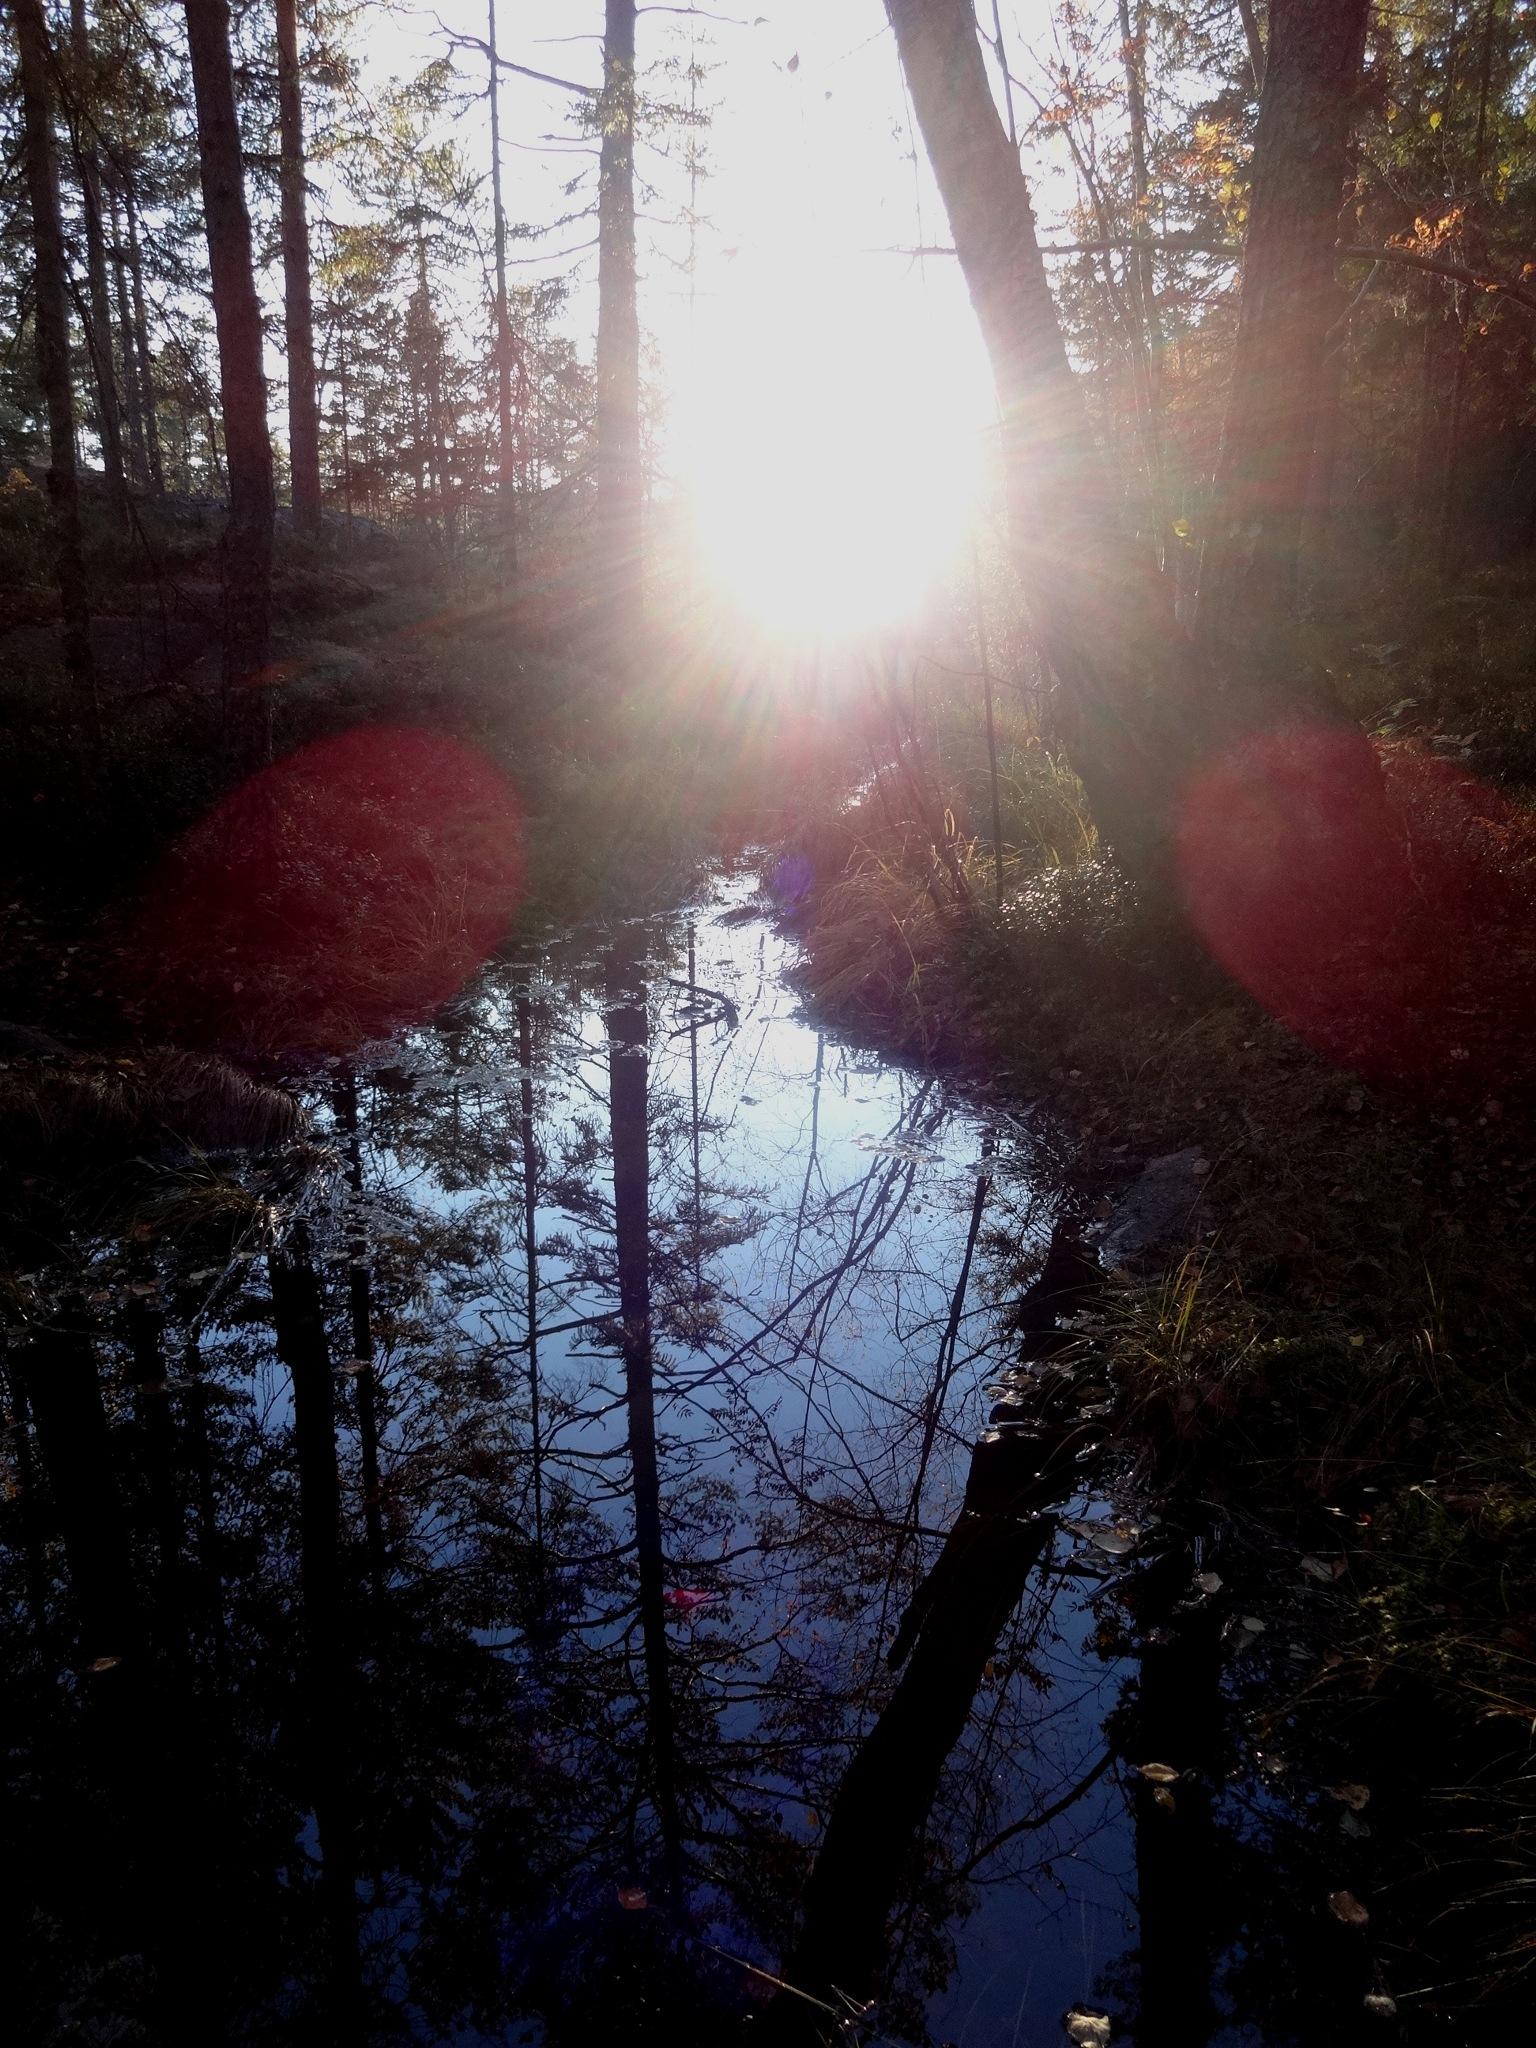 Mountain Creek by Karolis Abramavičius